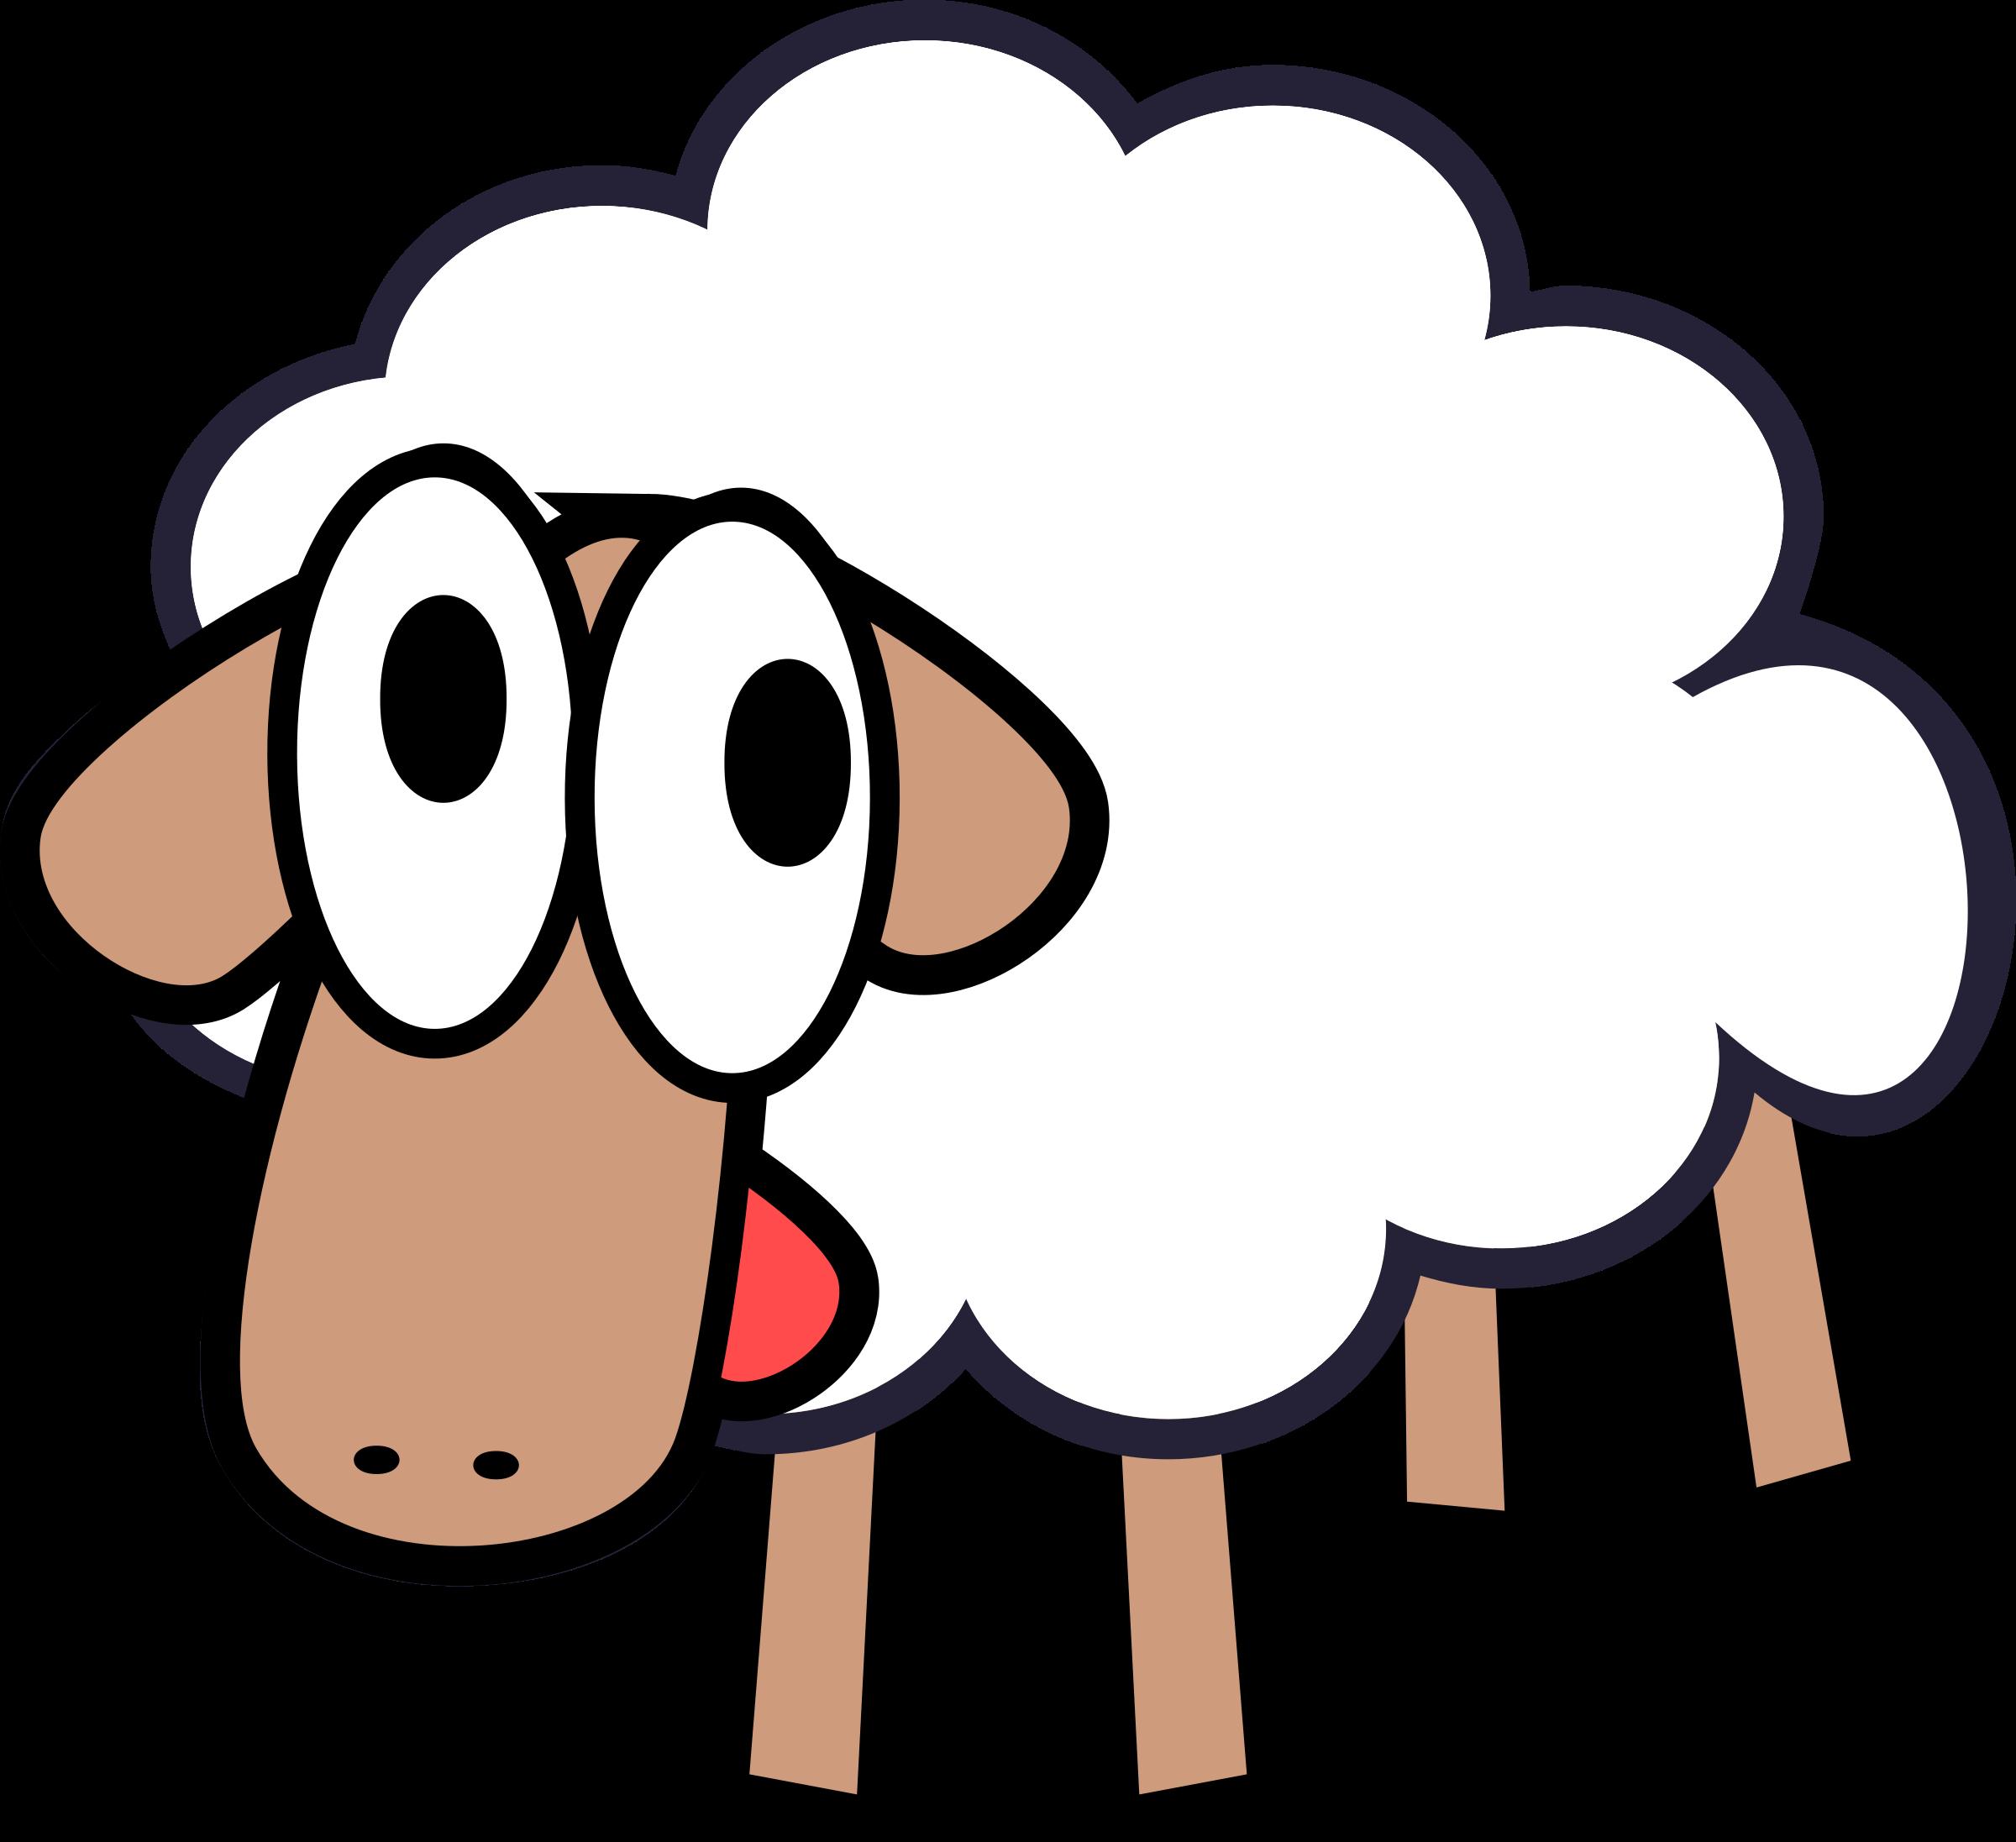 Sheep clipart transparent background #13